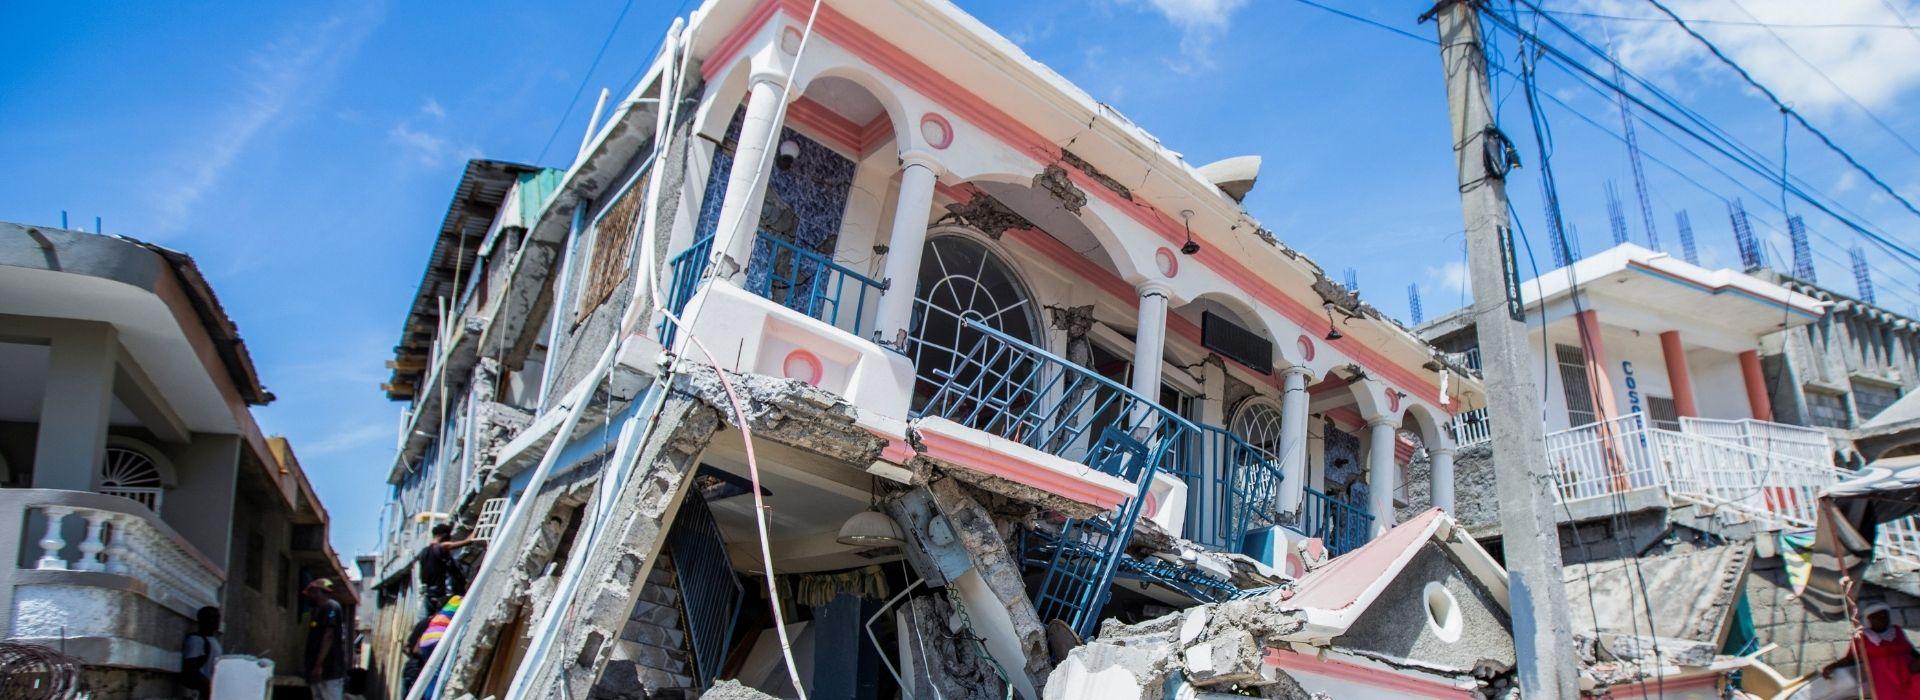 Donate for Haiti